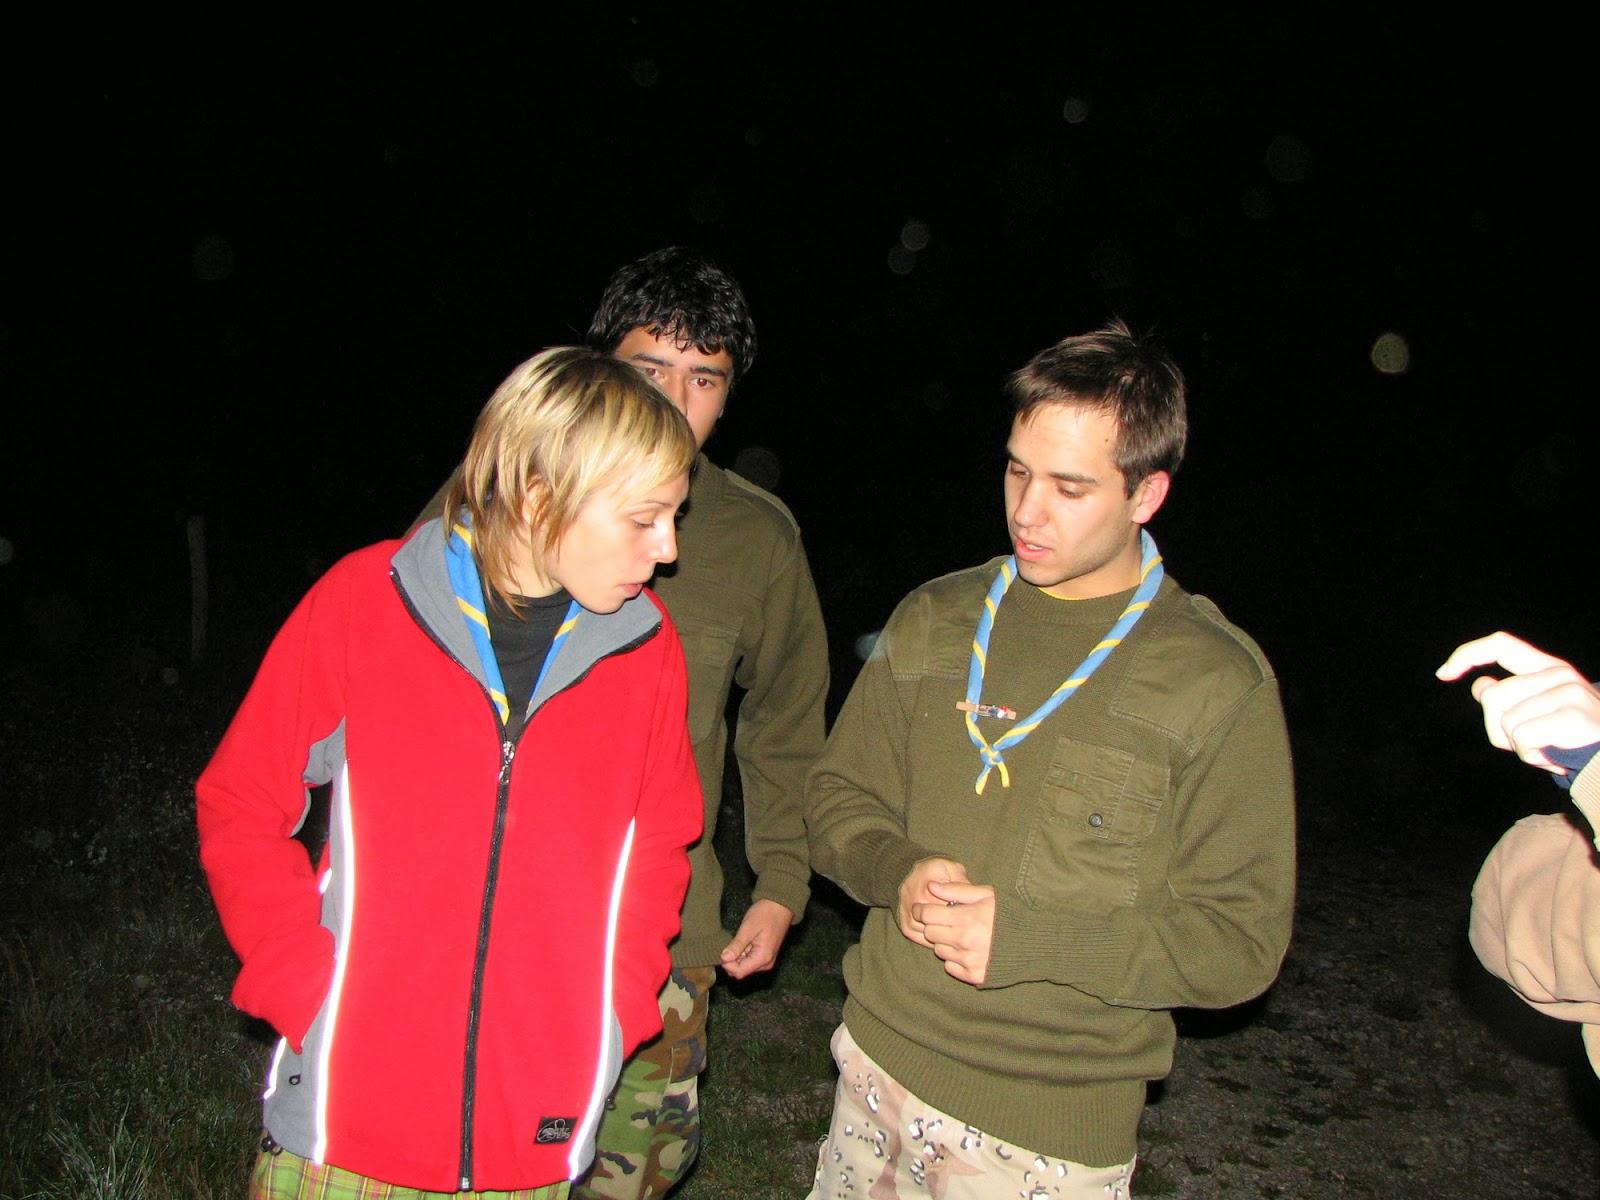 Prehod PP, Ilirska Bistrica 2005 - picture%2B025.jpg